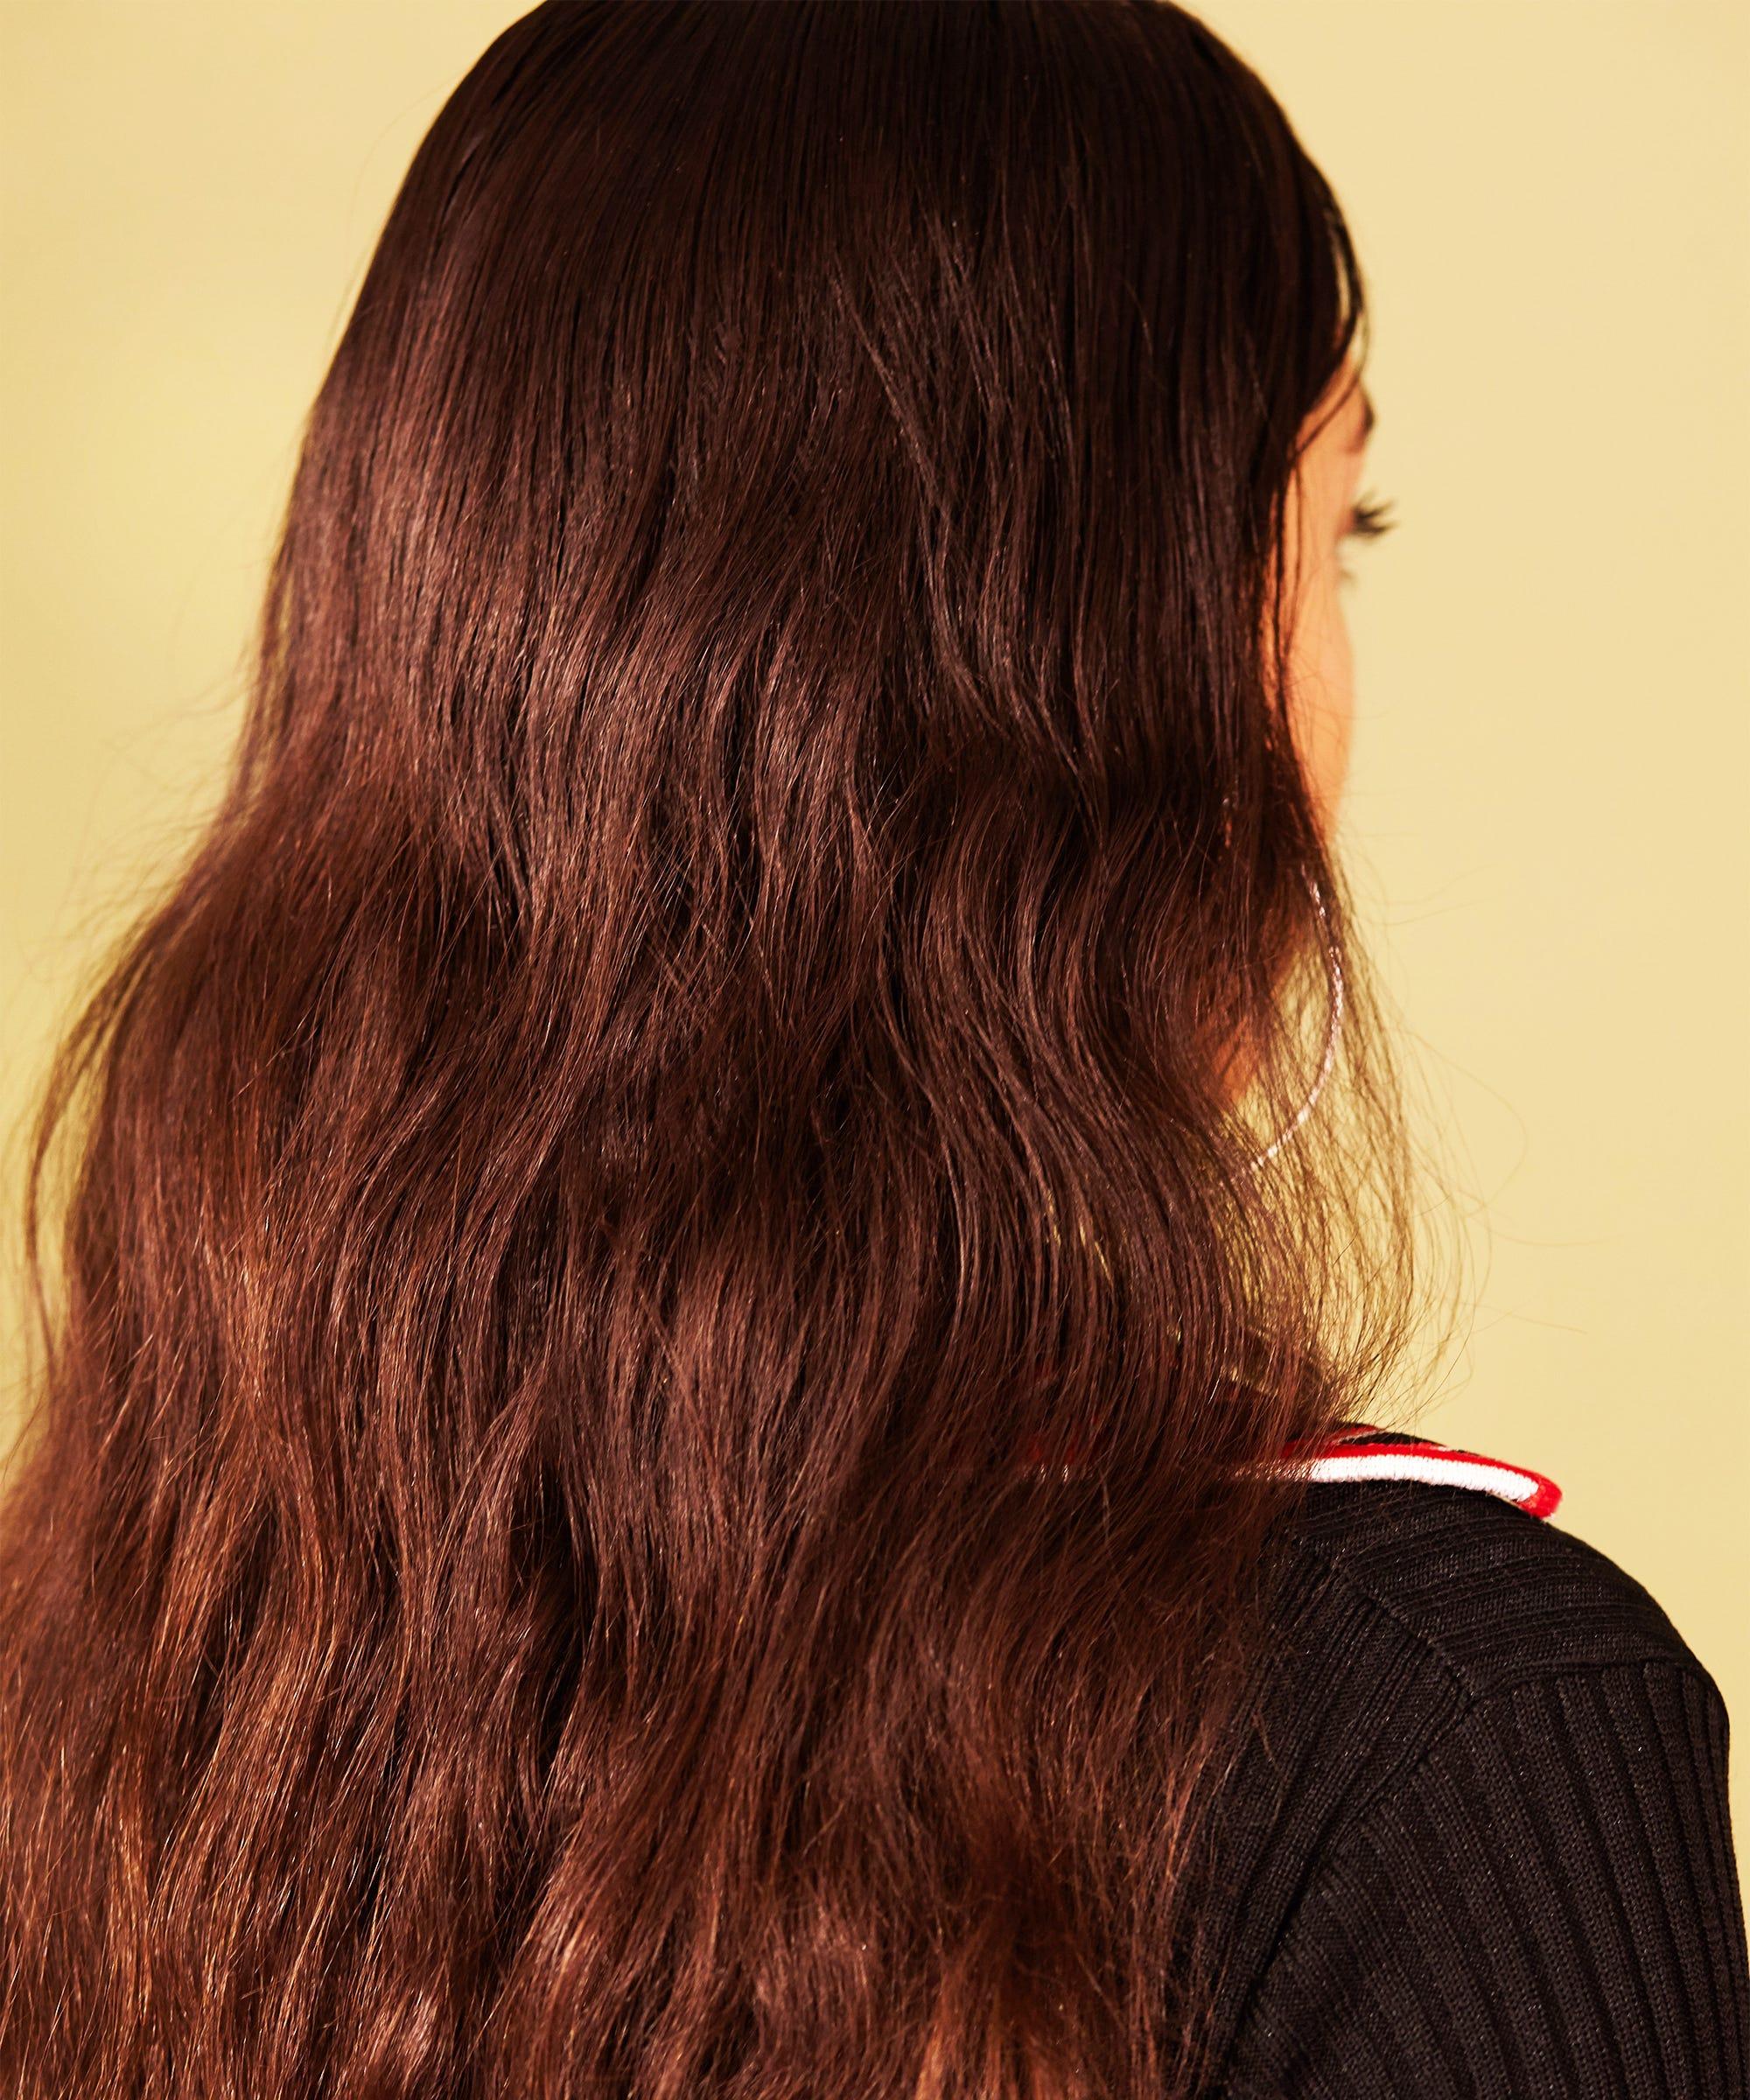 Is Apple Cider Vinegar Safe To Use For Hair Dandruff